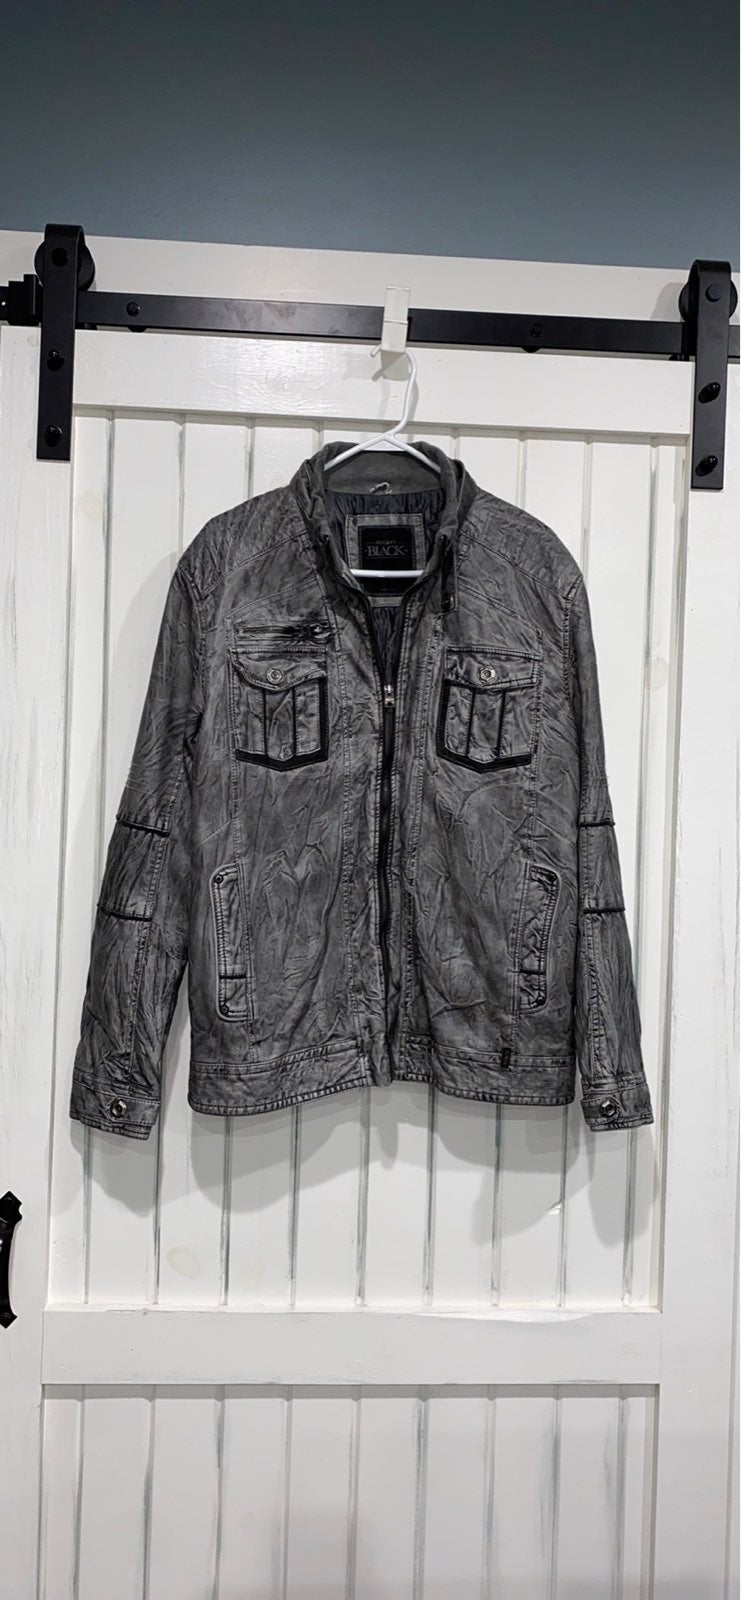 Buckle Black Grey Leather Jacket